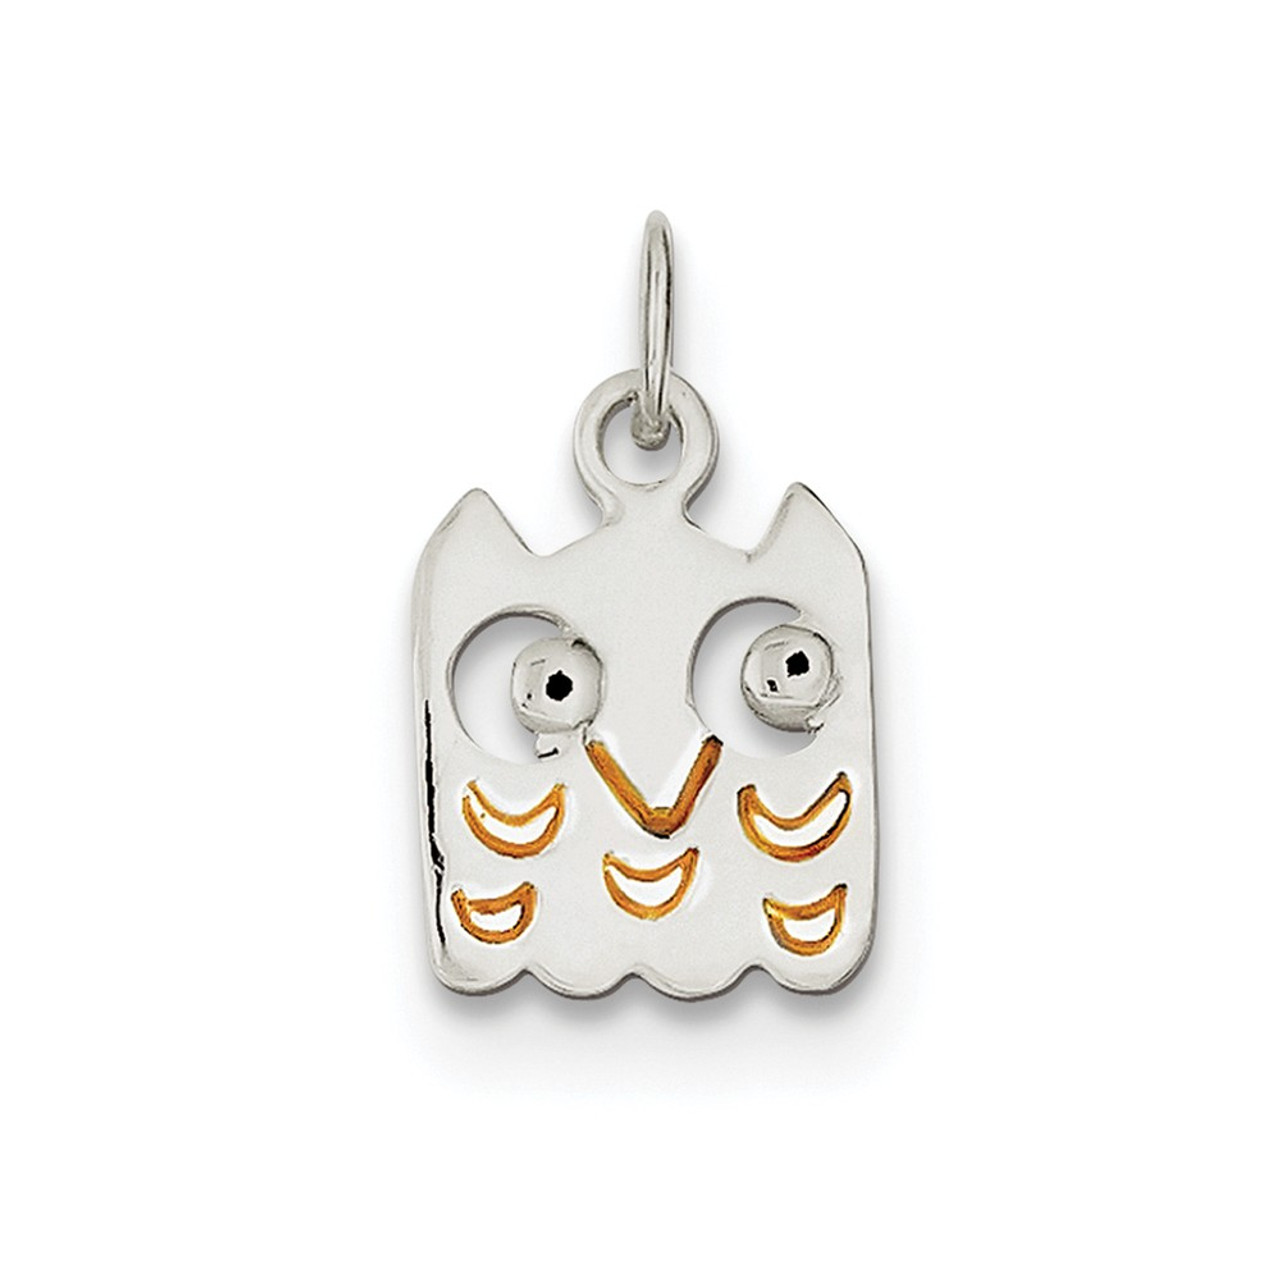 .925 Sterling Silver Pink Enameled CZ Elephant Charm Pendant